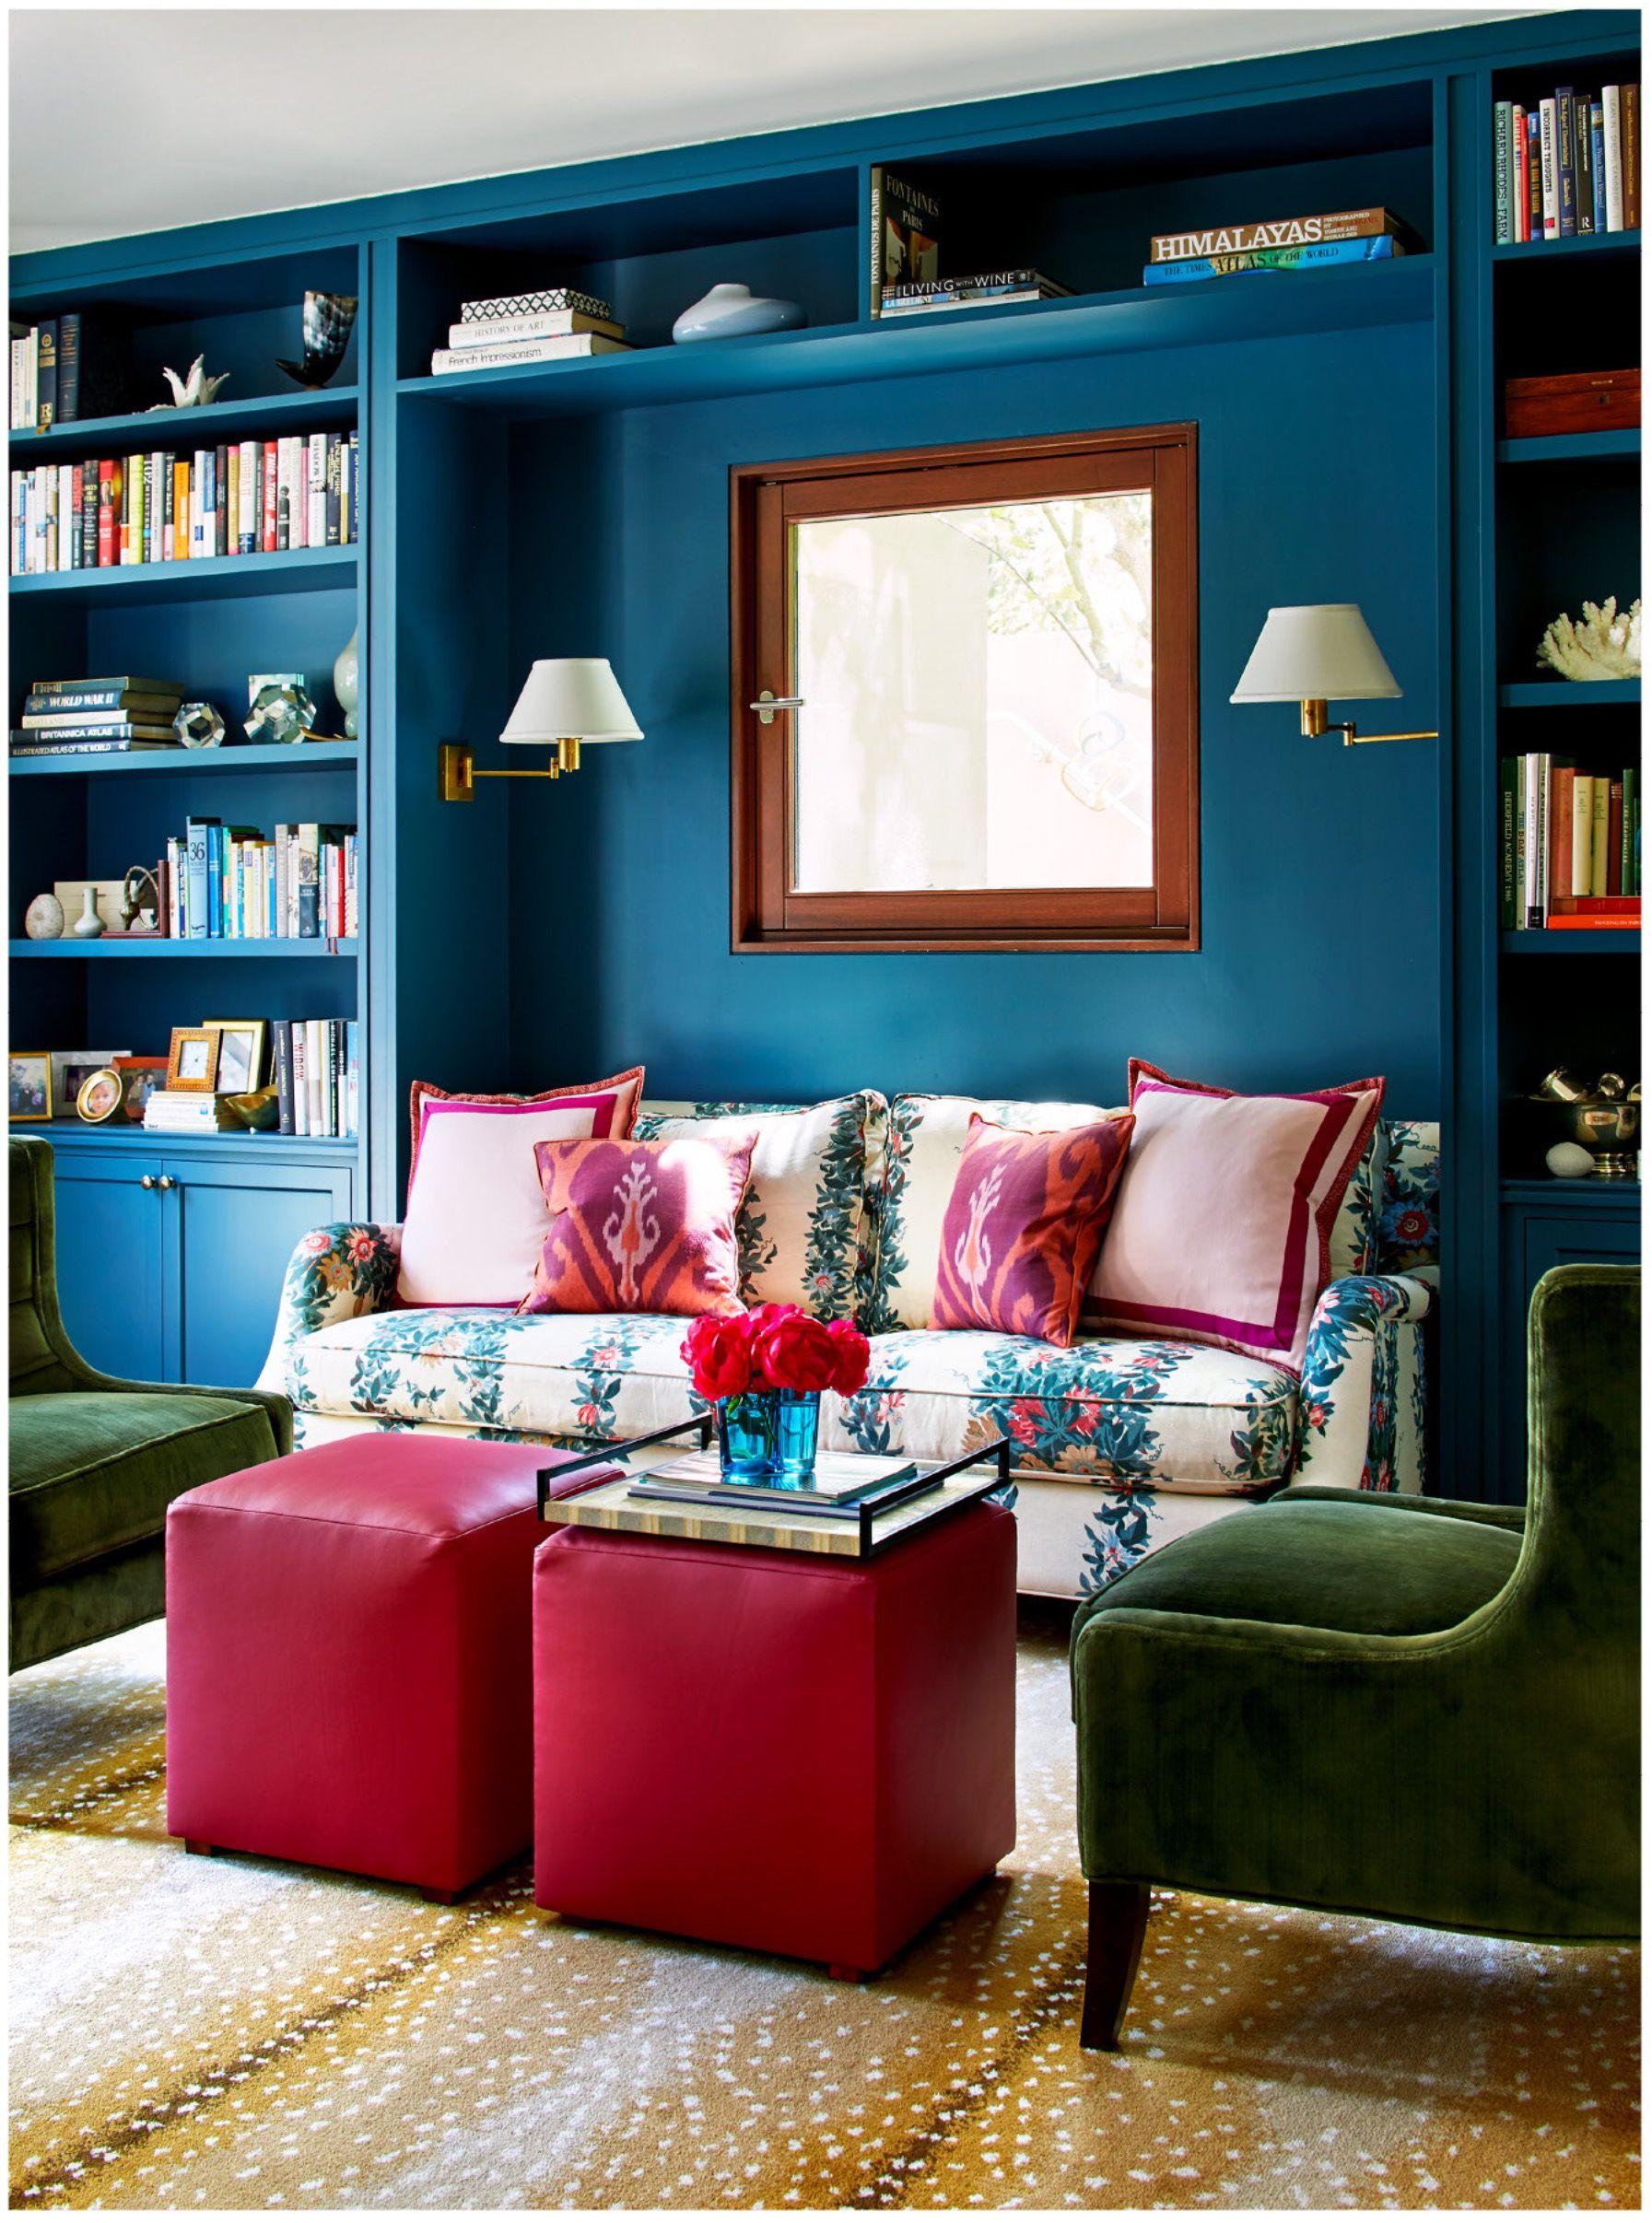 Pin by Julie Davenport on Living rooms Pinterest